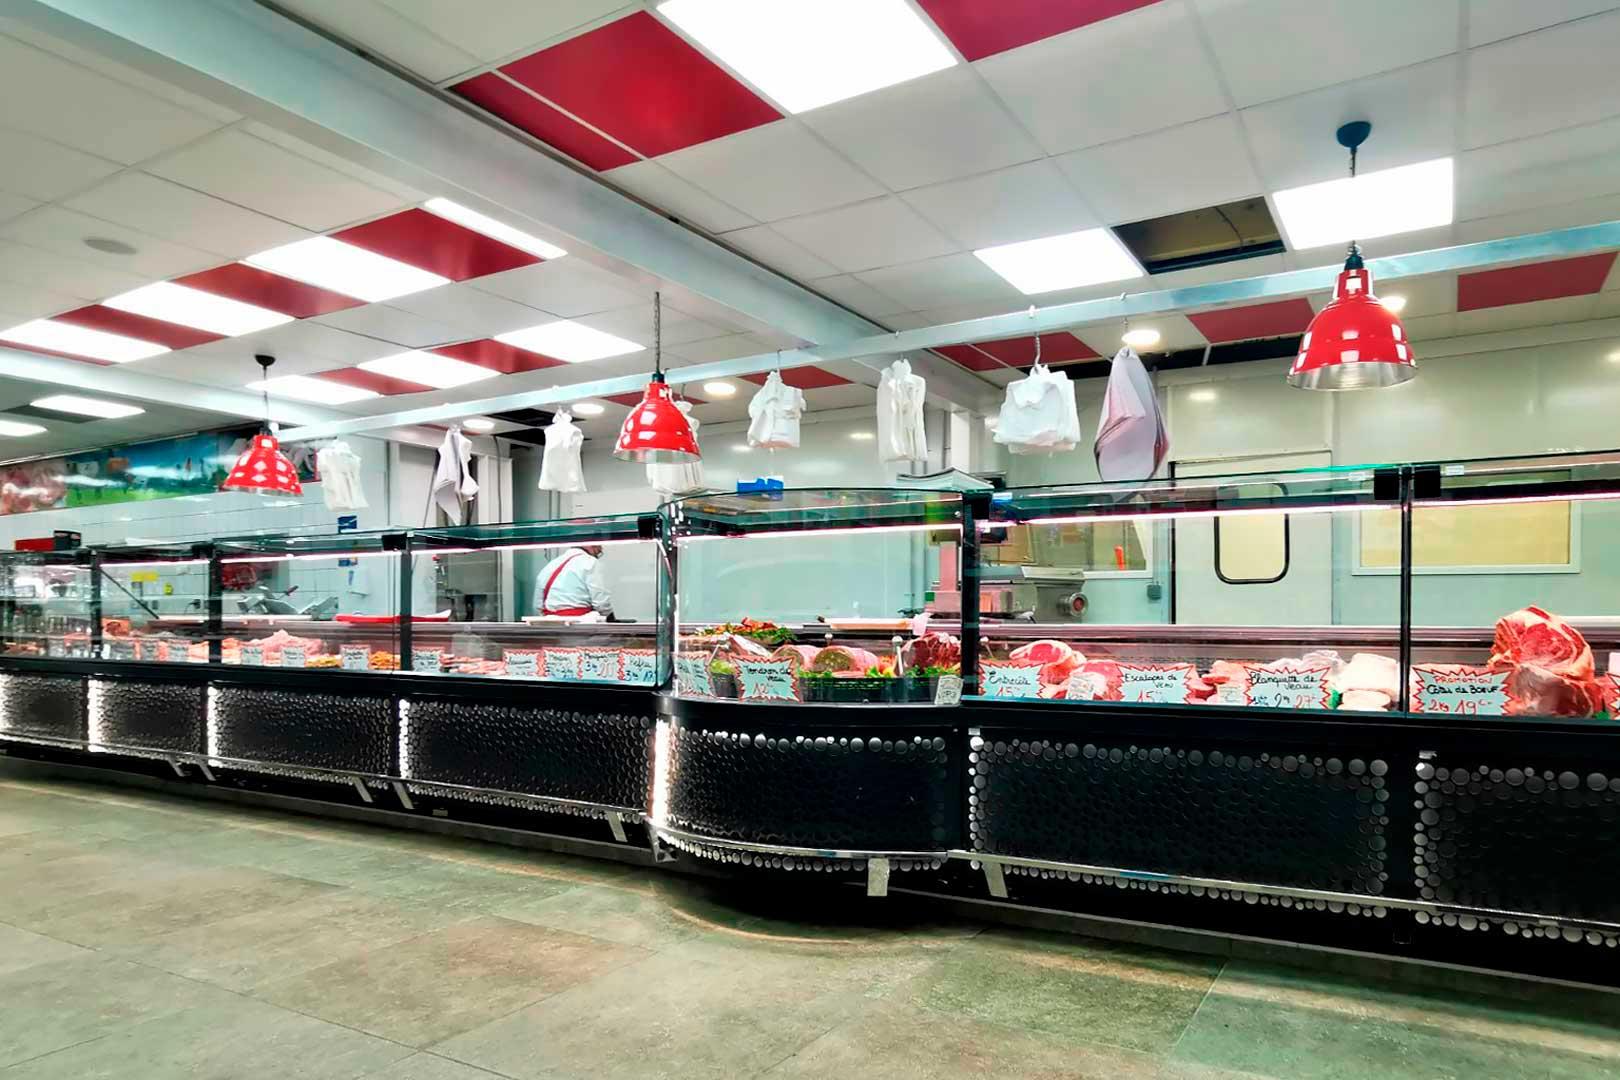 Refrigerated counters Missouri MC 120 M, minimarket OTM in France